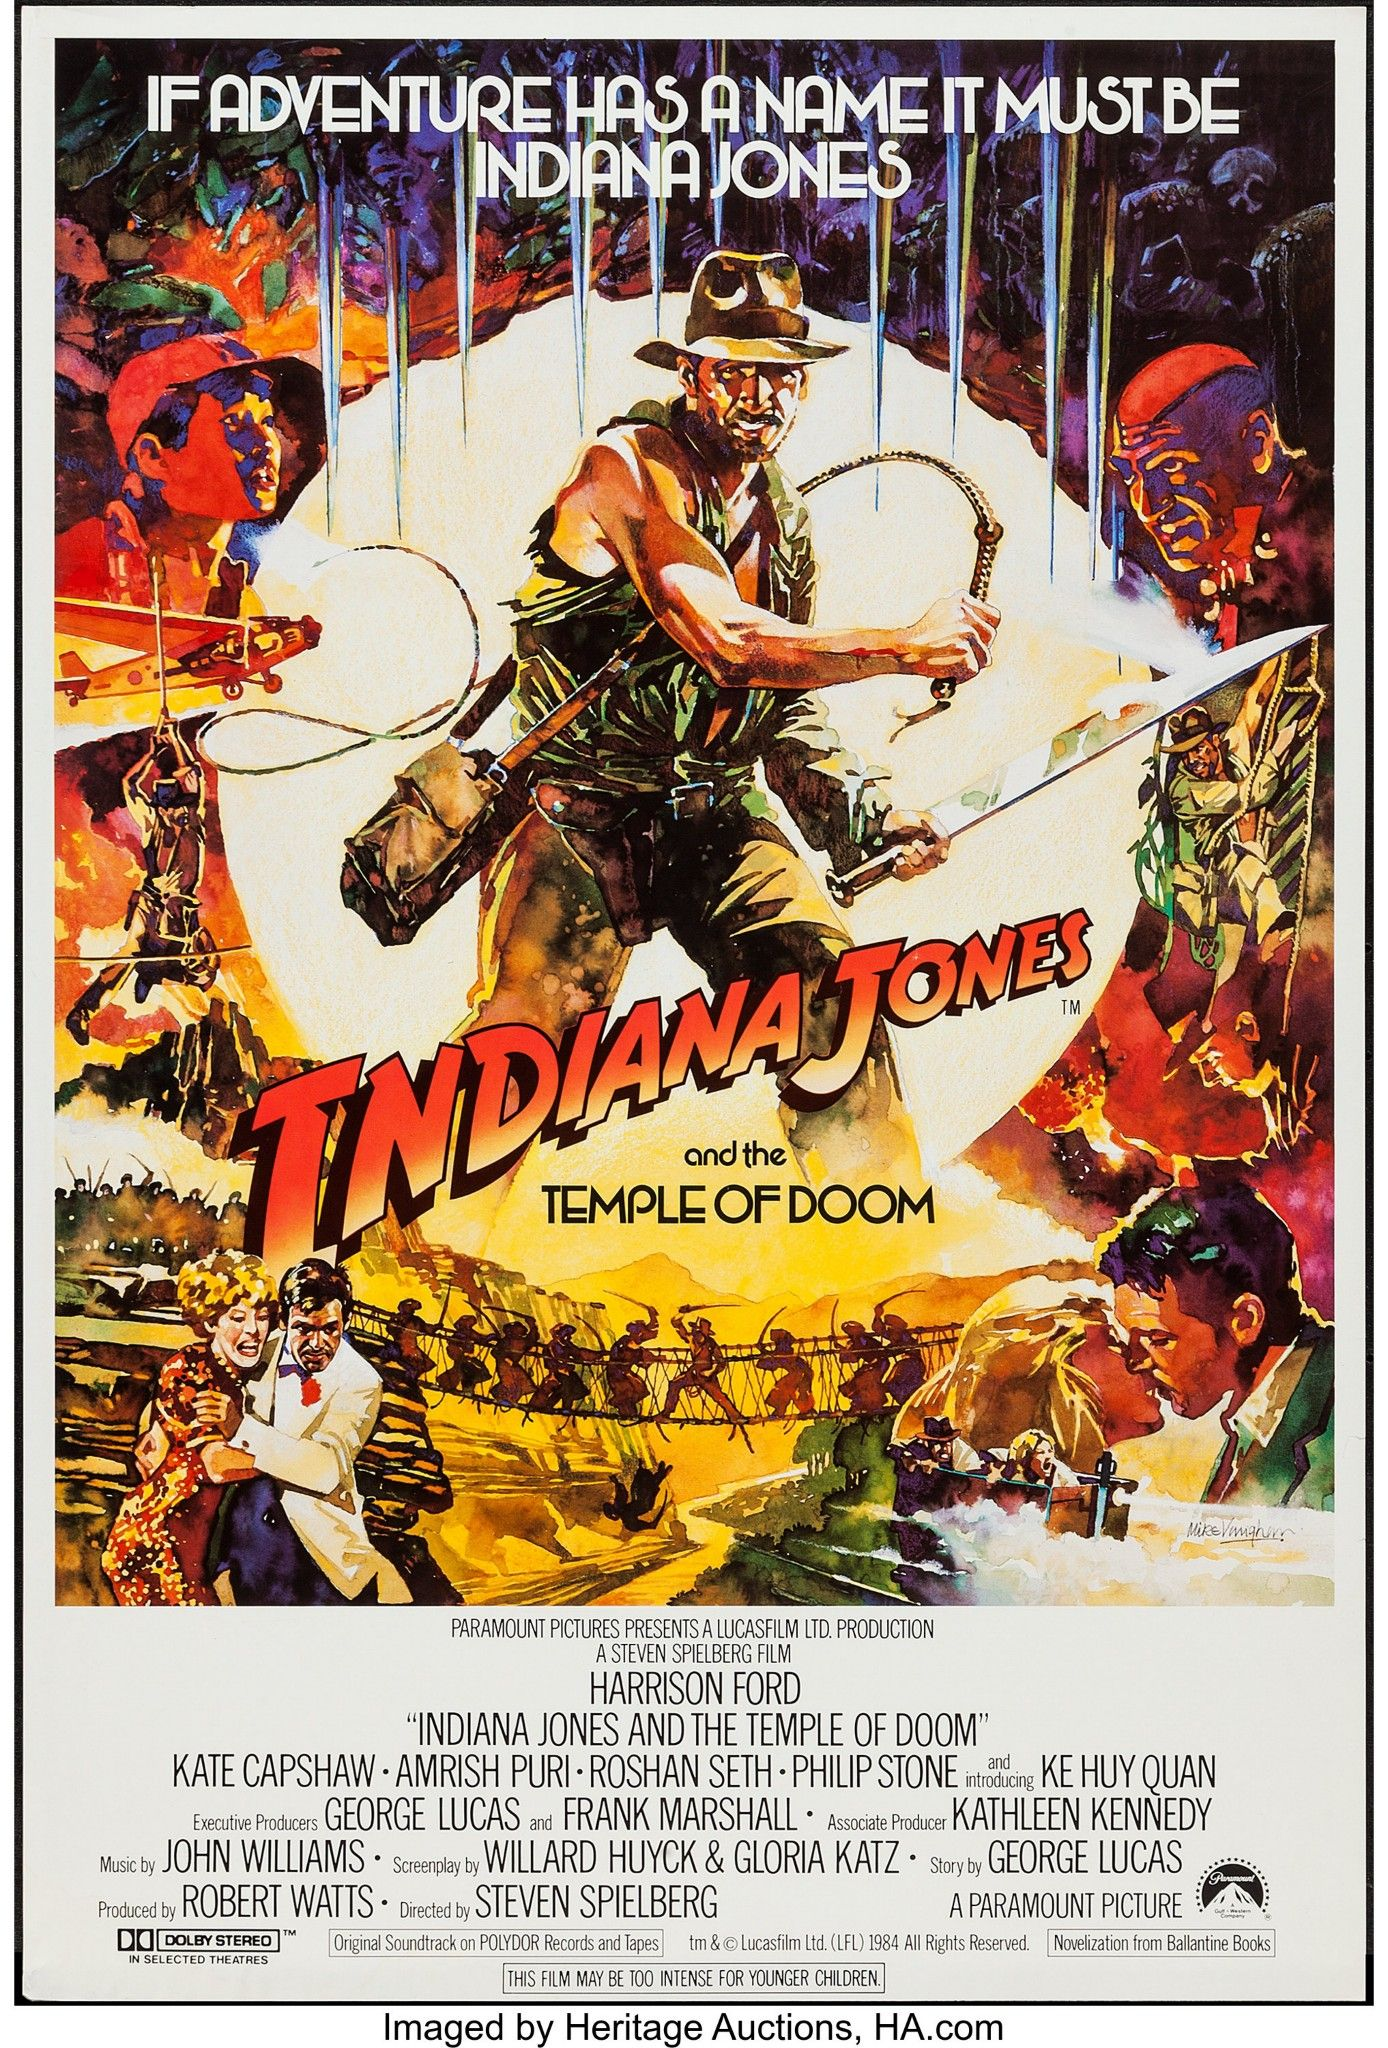 Indiana Jones y el reino de las calaveras - Página 12 7e653490b1cbd6a3d314d26dd4b8d59c